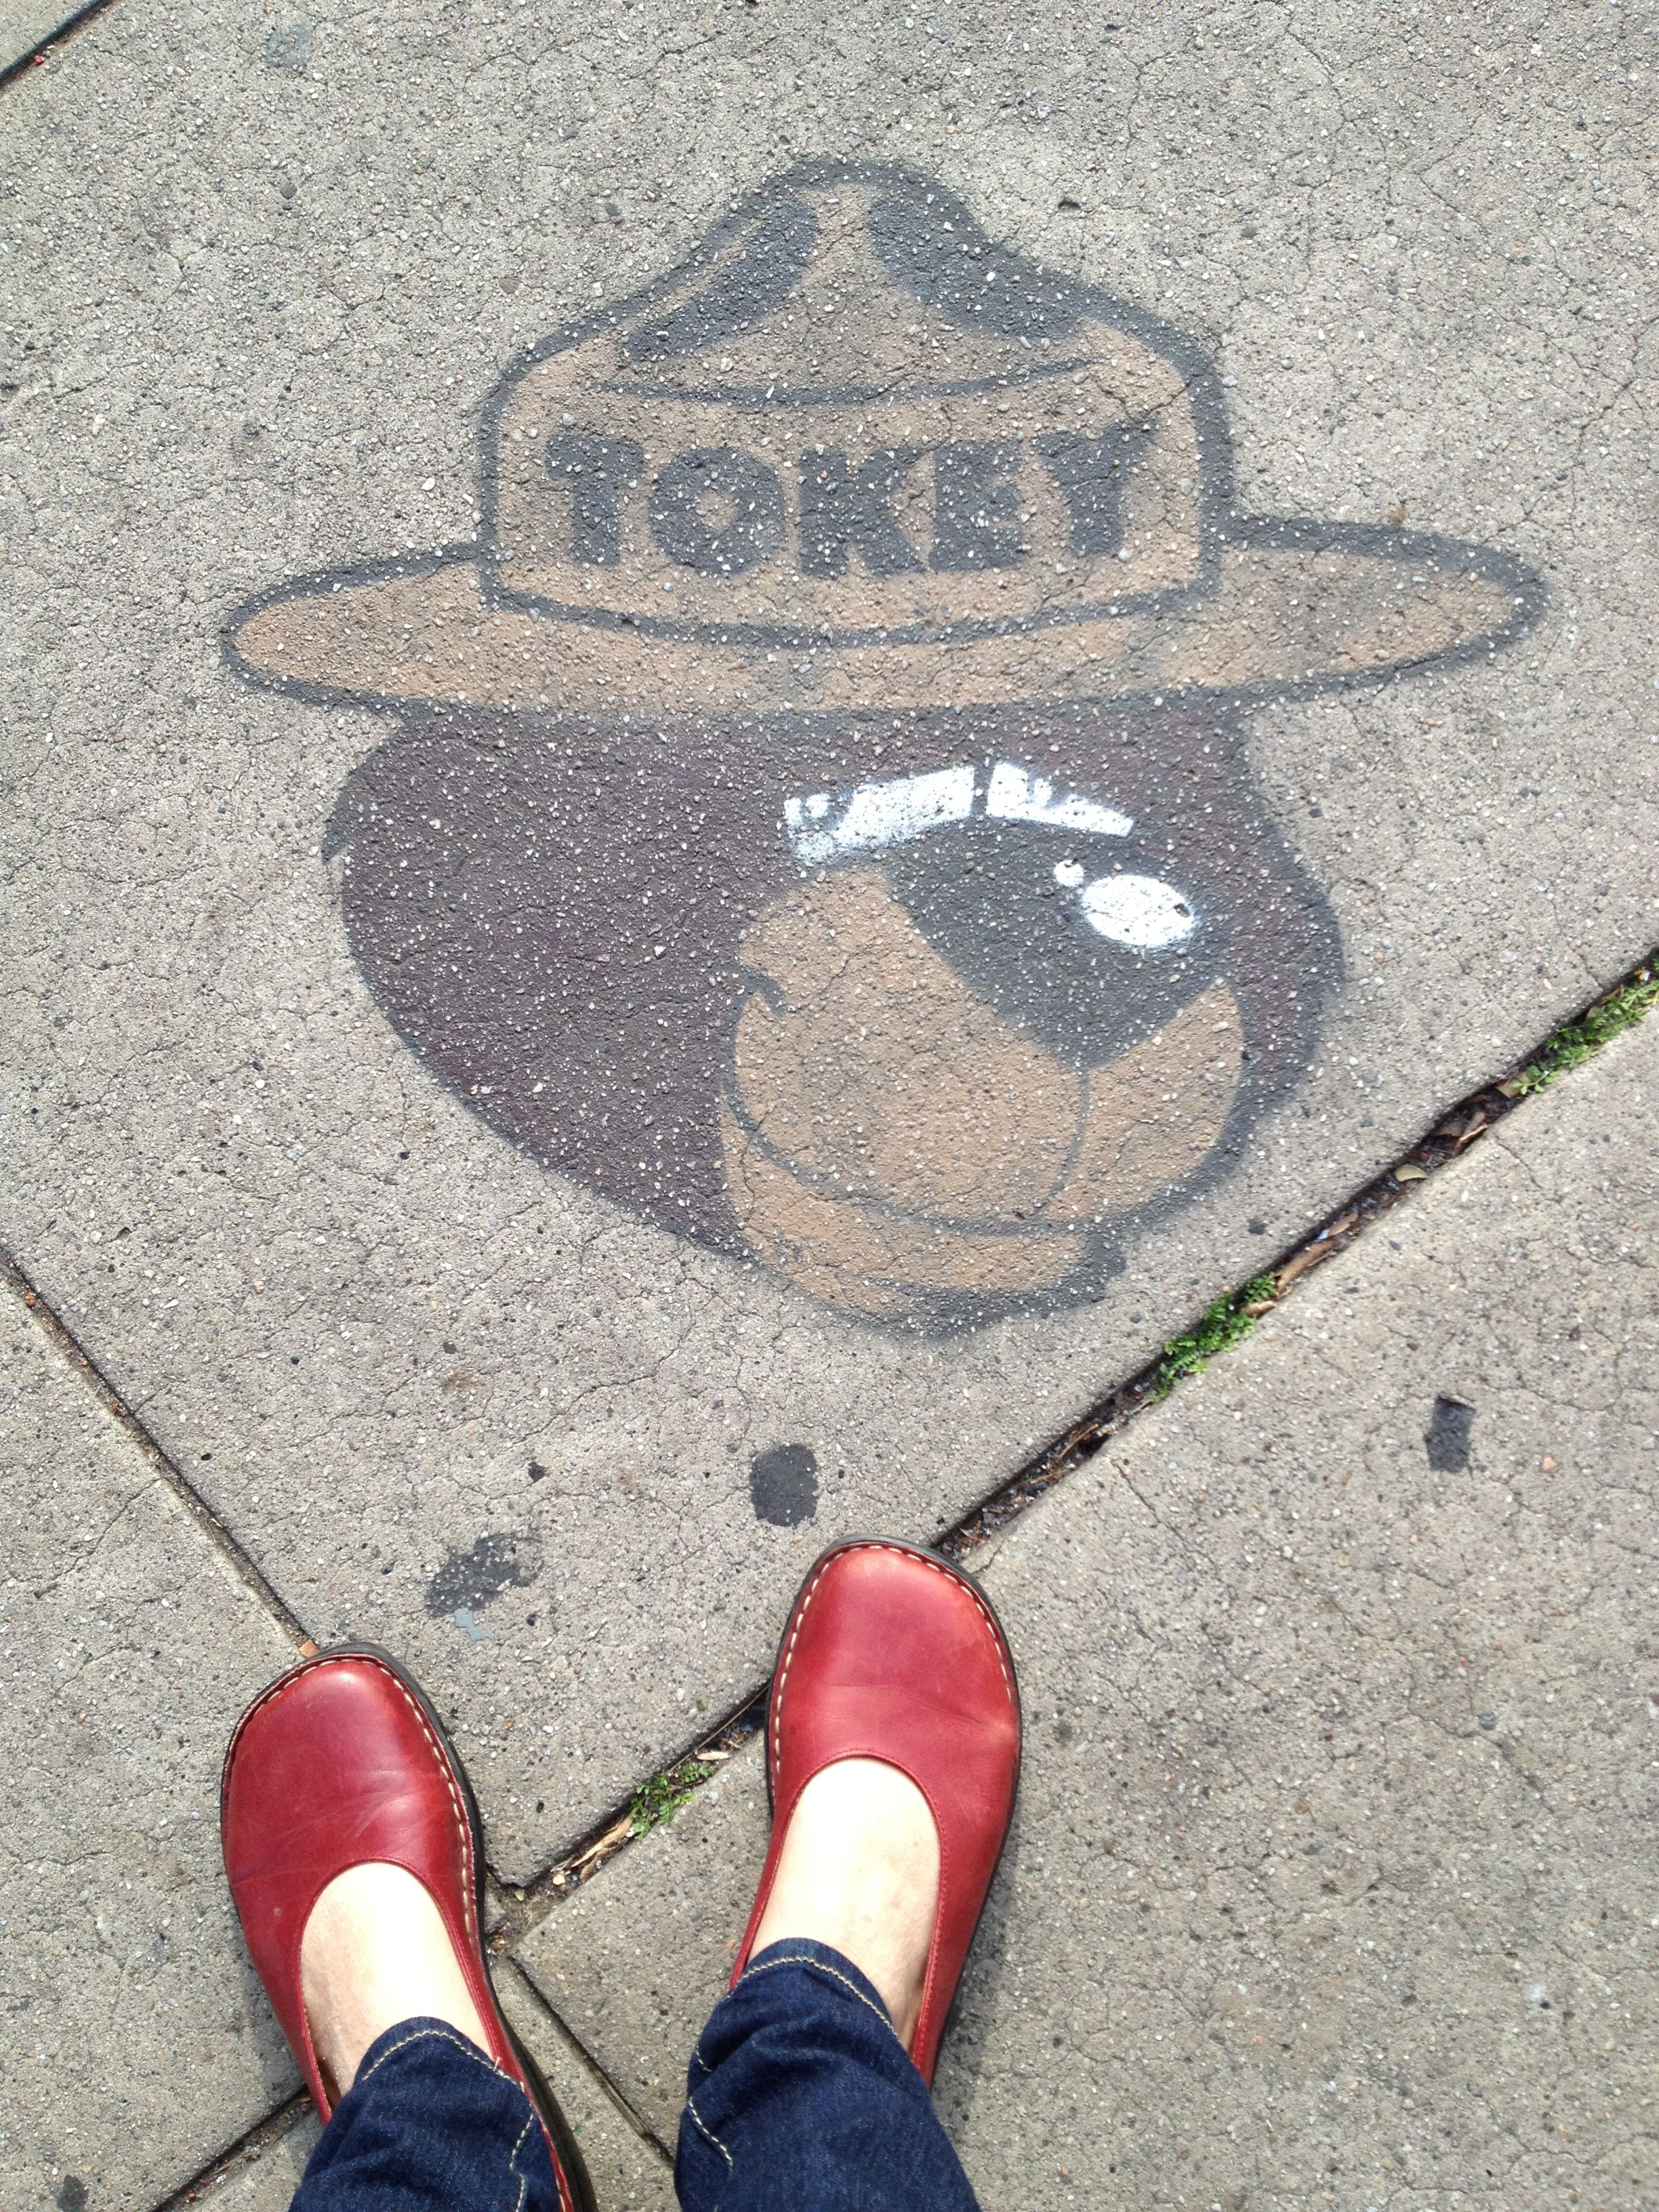 Melrose, Los Angeles 2012